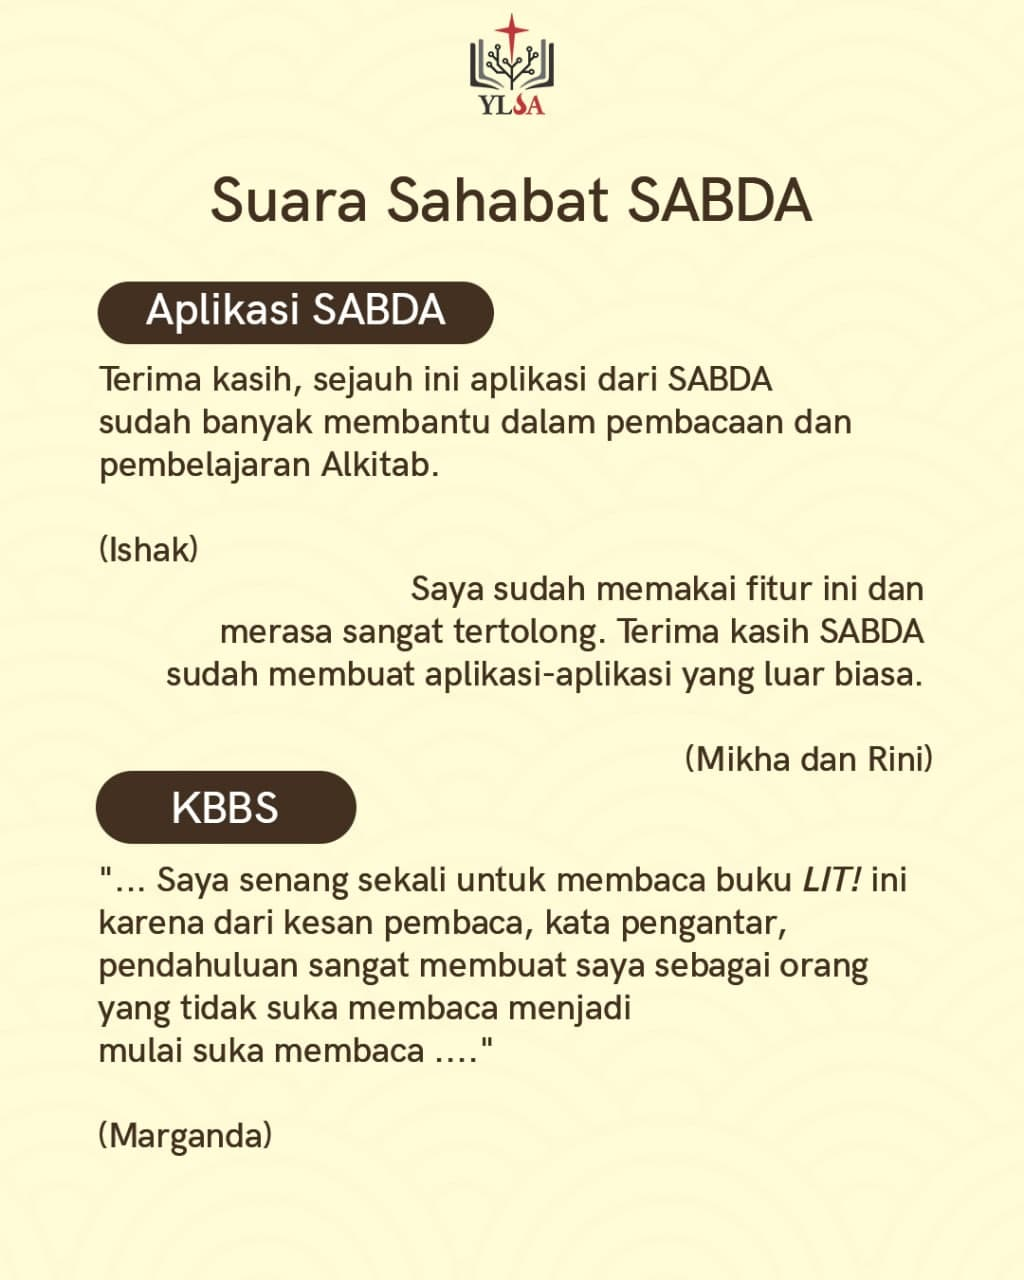 Testimoni dari Sahabat SABDA mengenai Aplikasi SABDA dan Klub Baca Buku SABDA (KBBS)